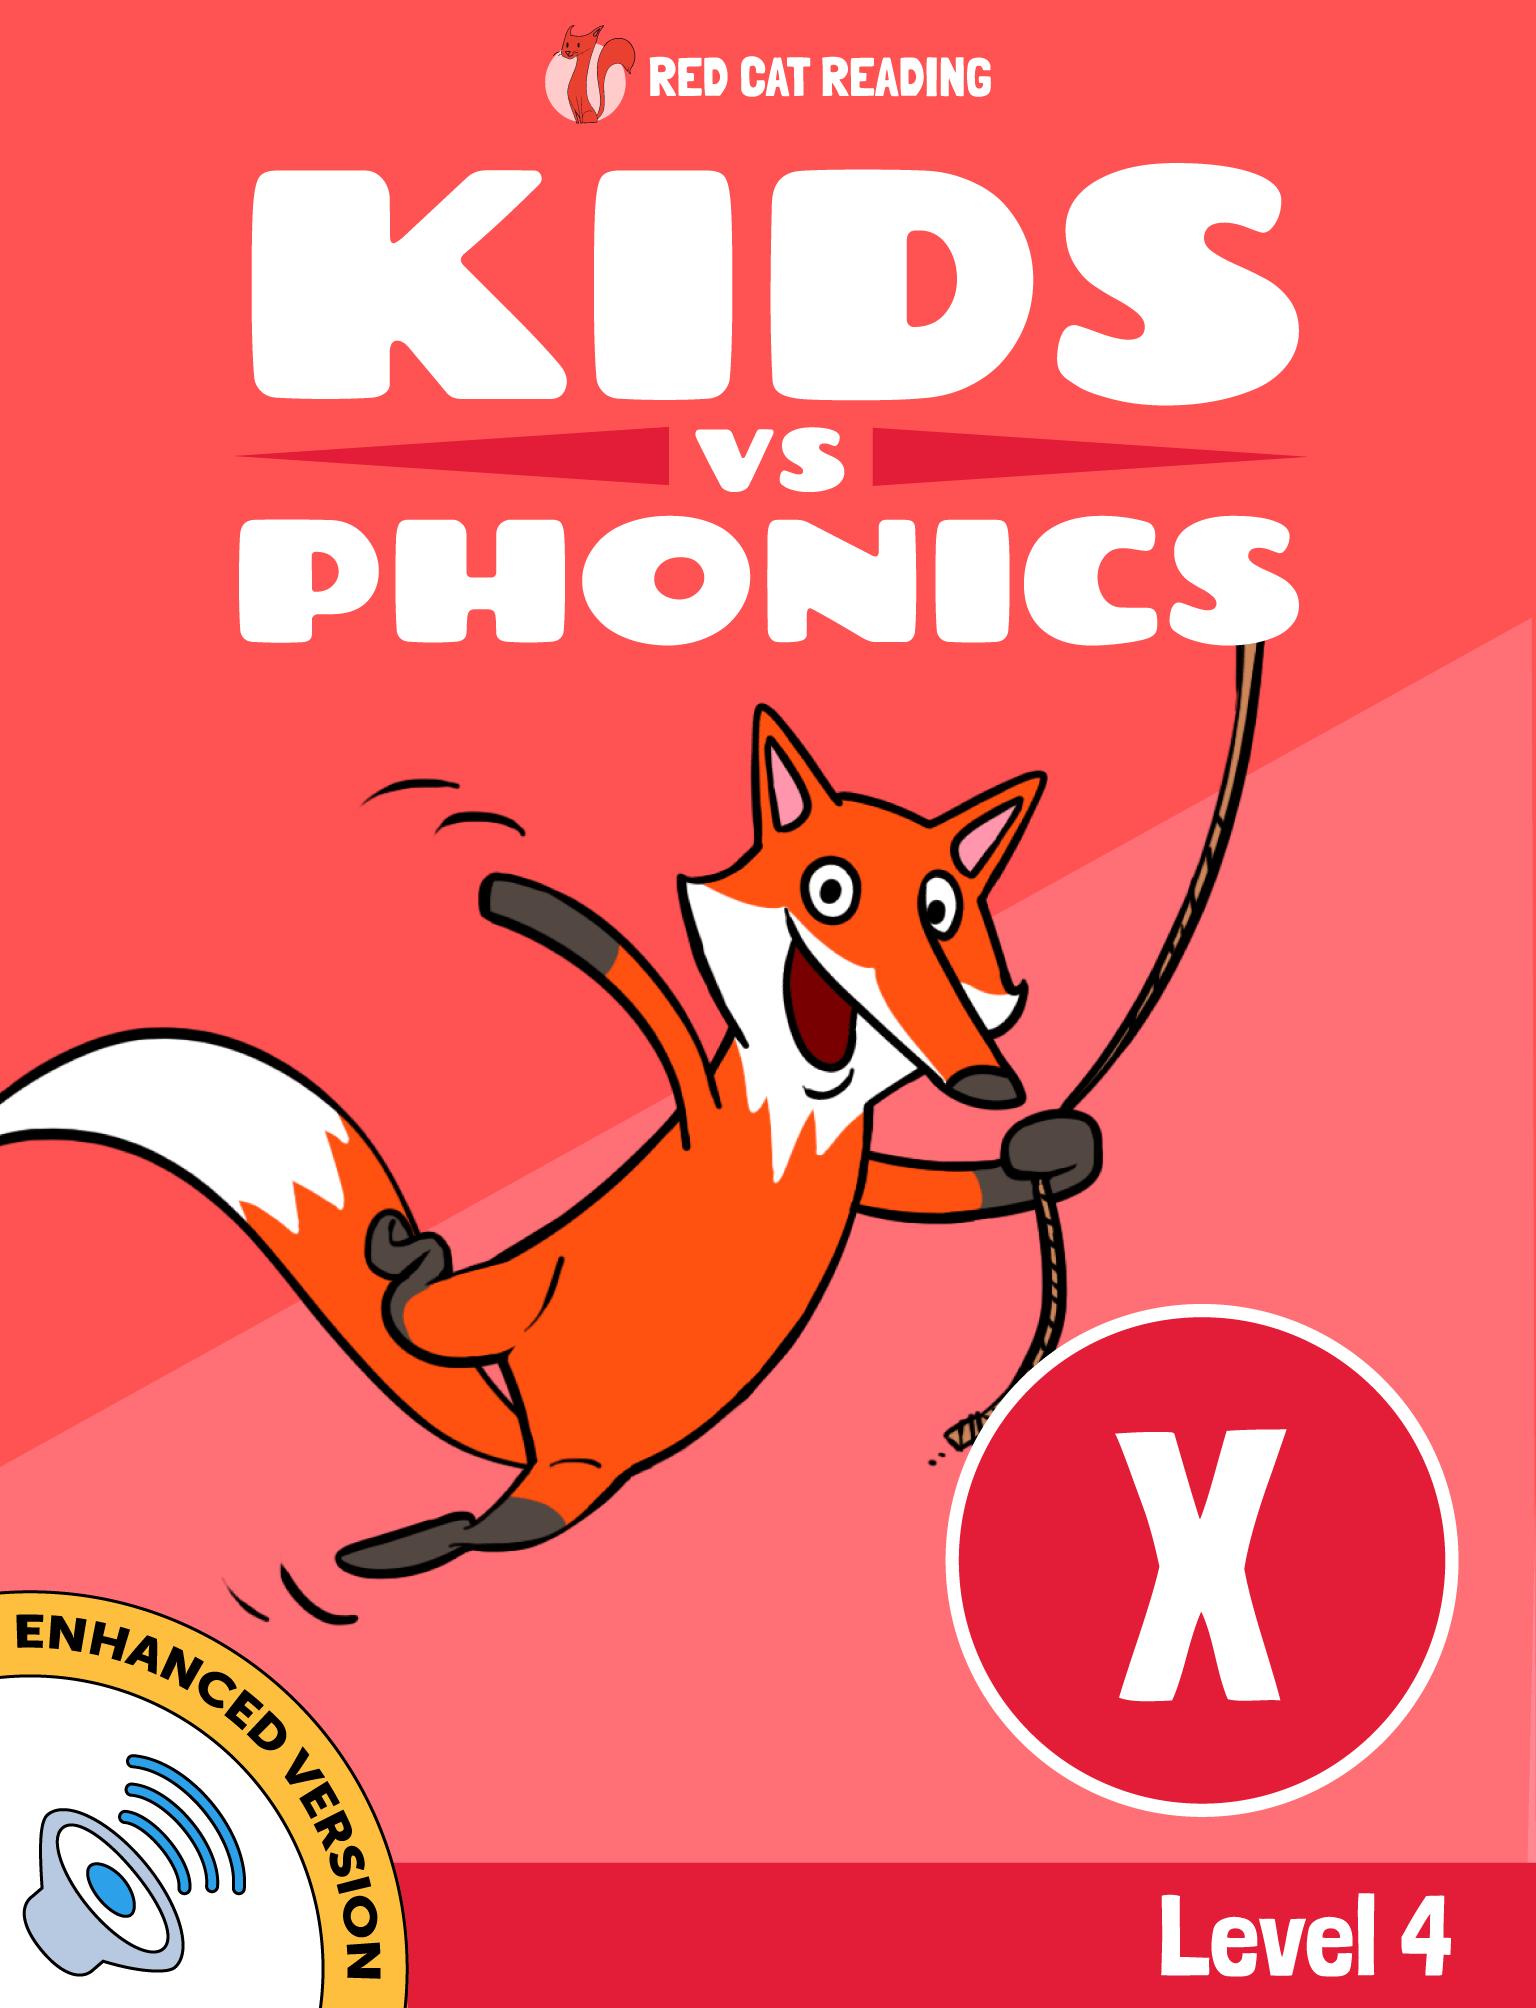 Red Cat Reading Kids vs Phonics Level 4 Phonics X Sound